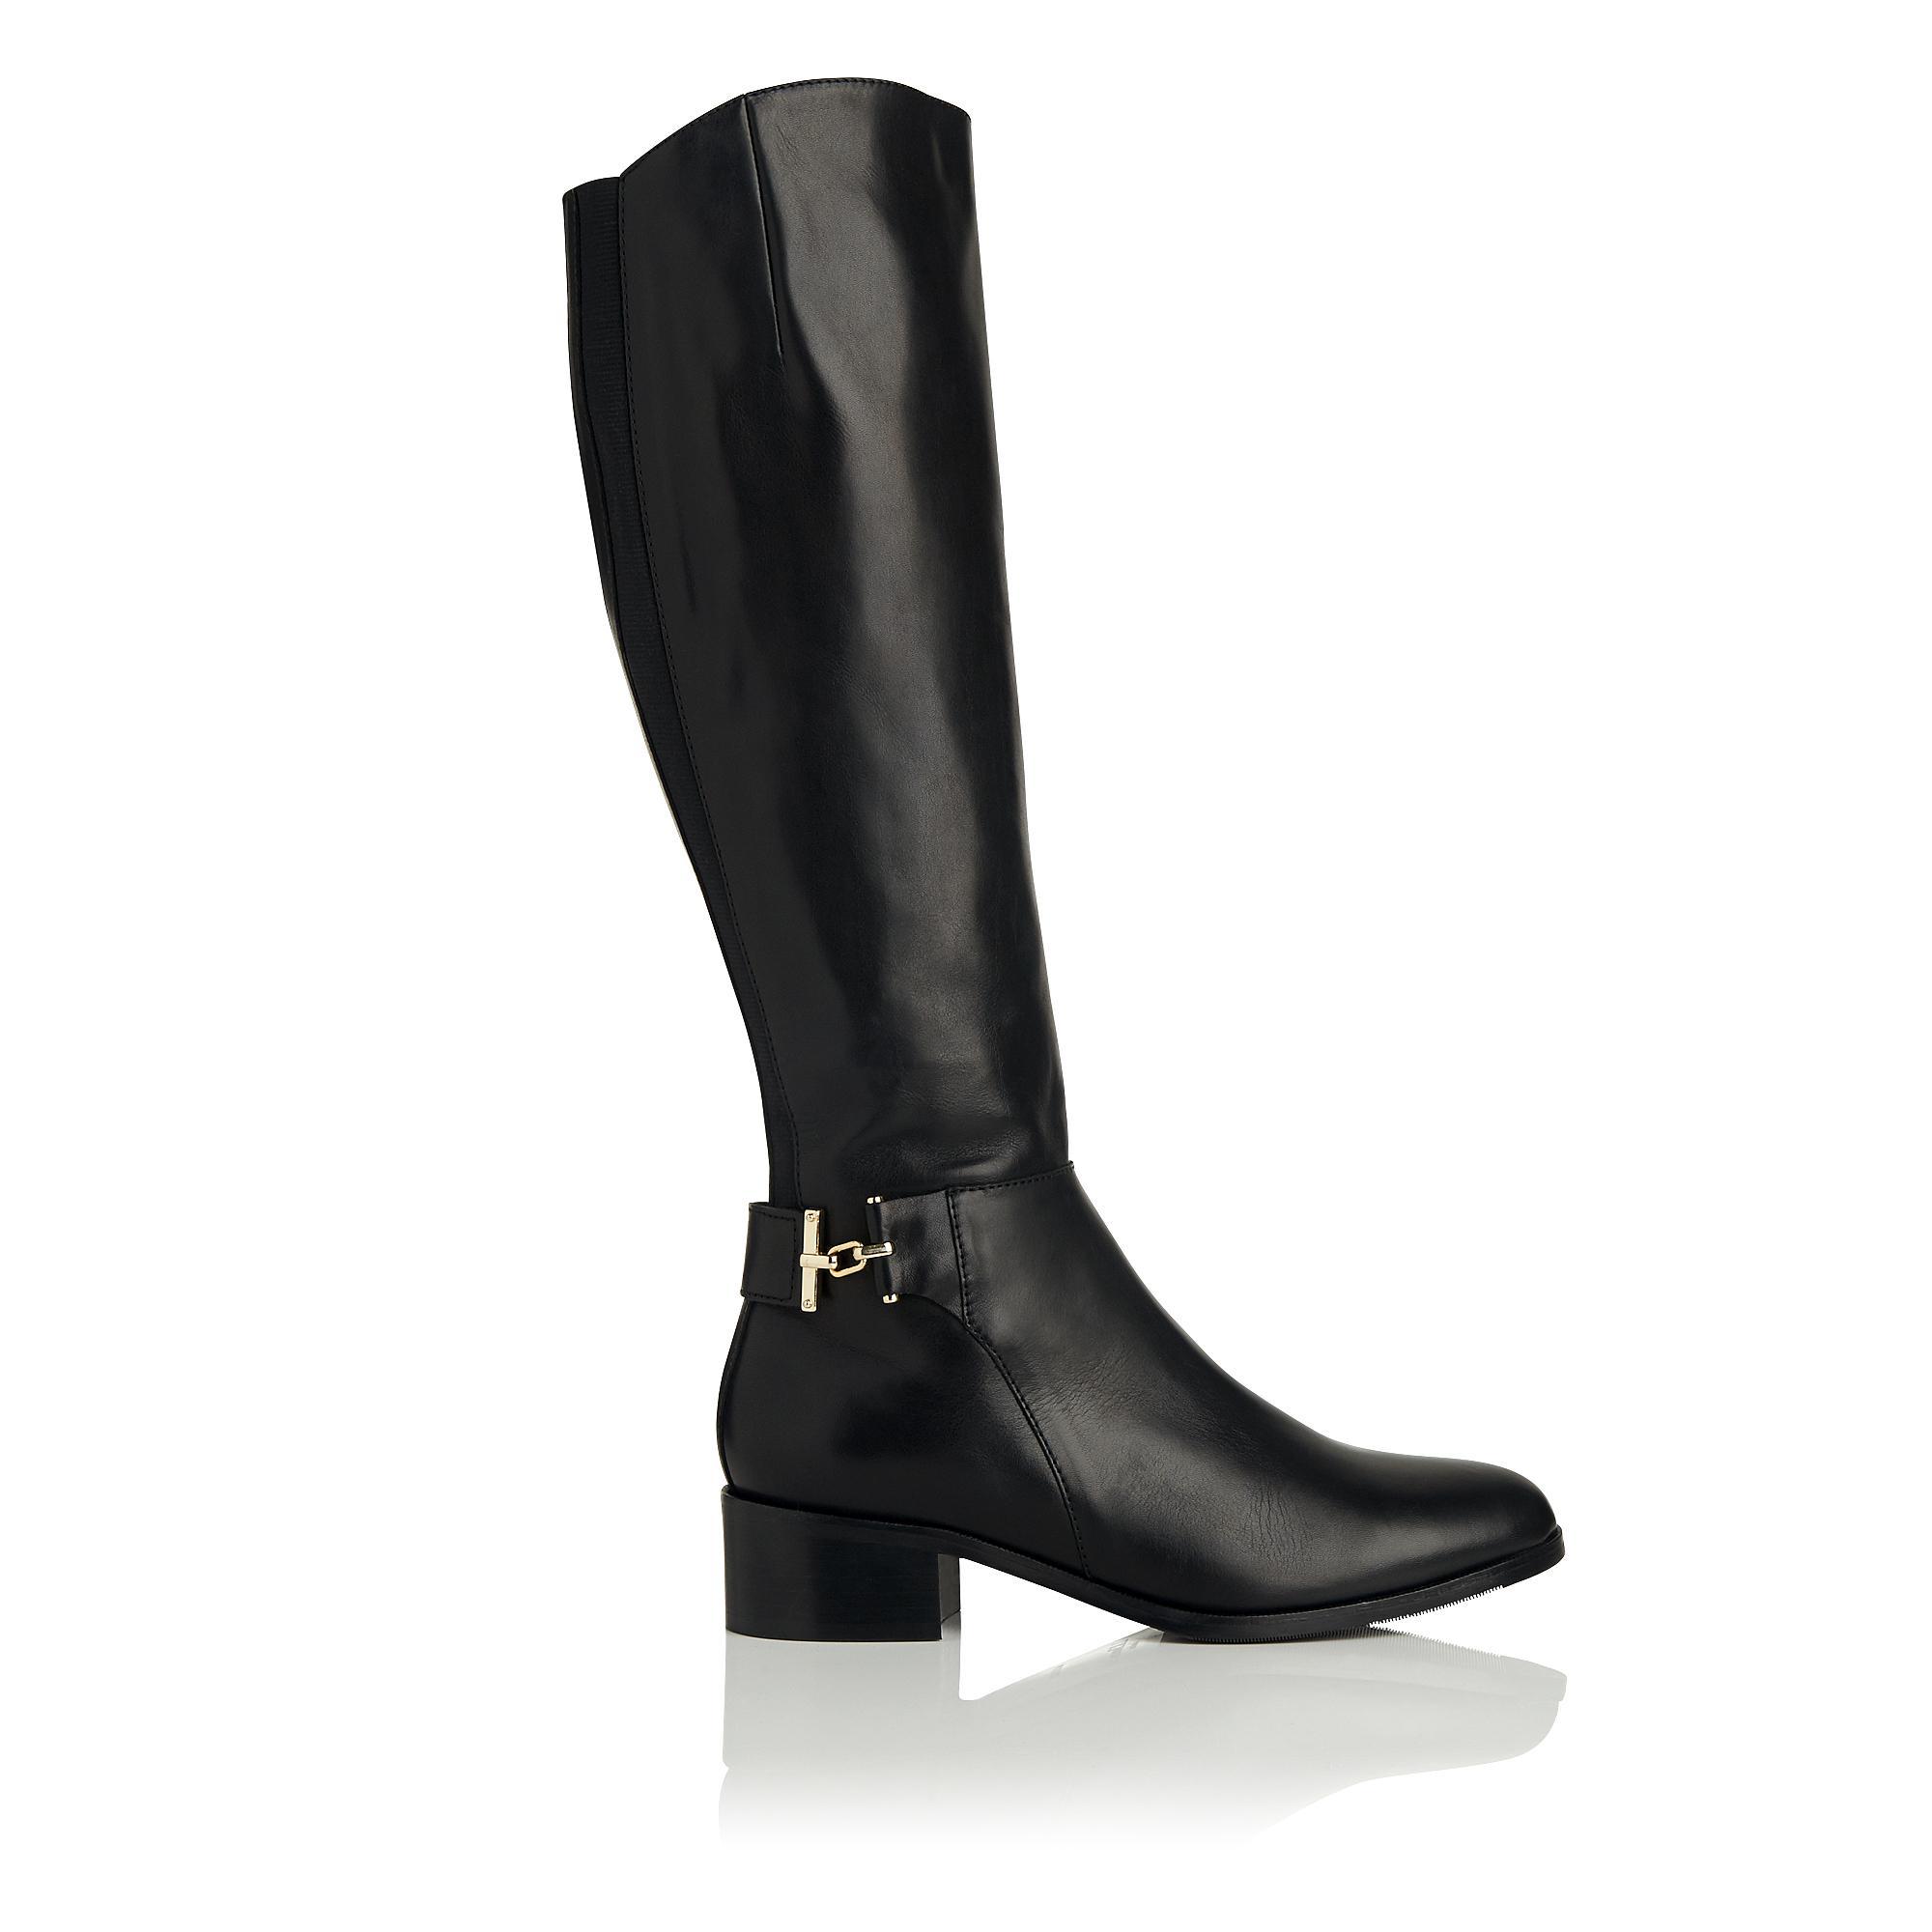 L.K.Bennett Georgina Knee High Leather Boot